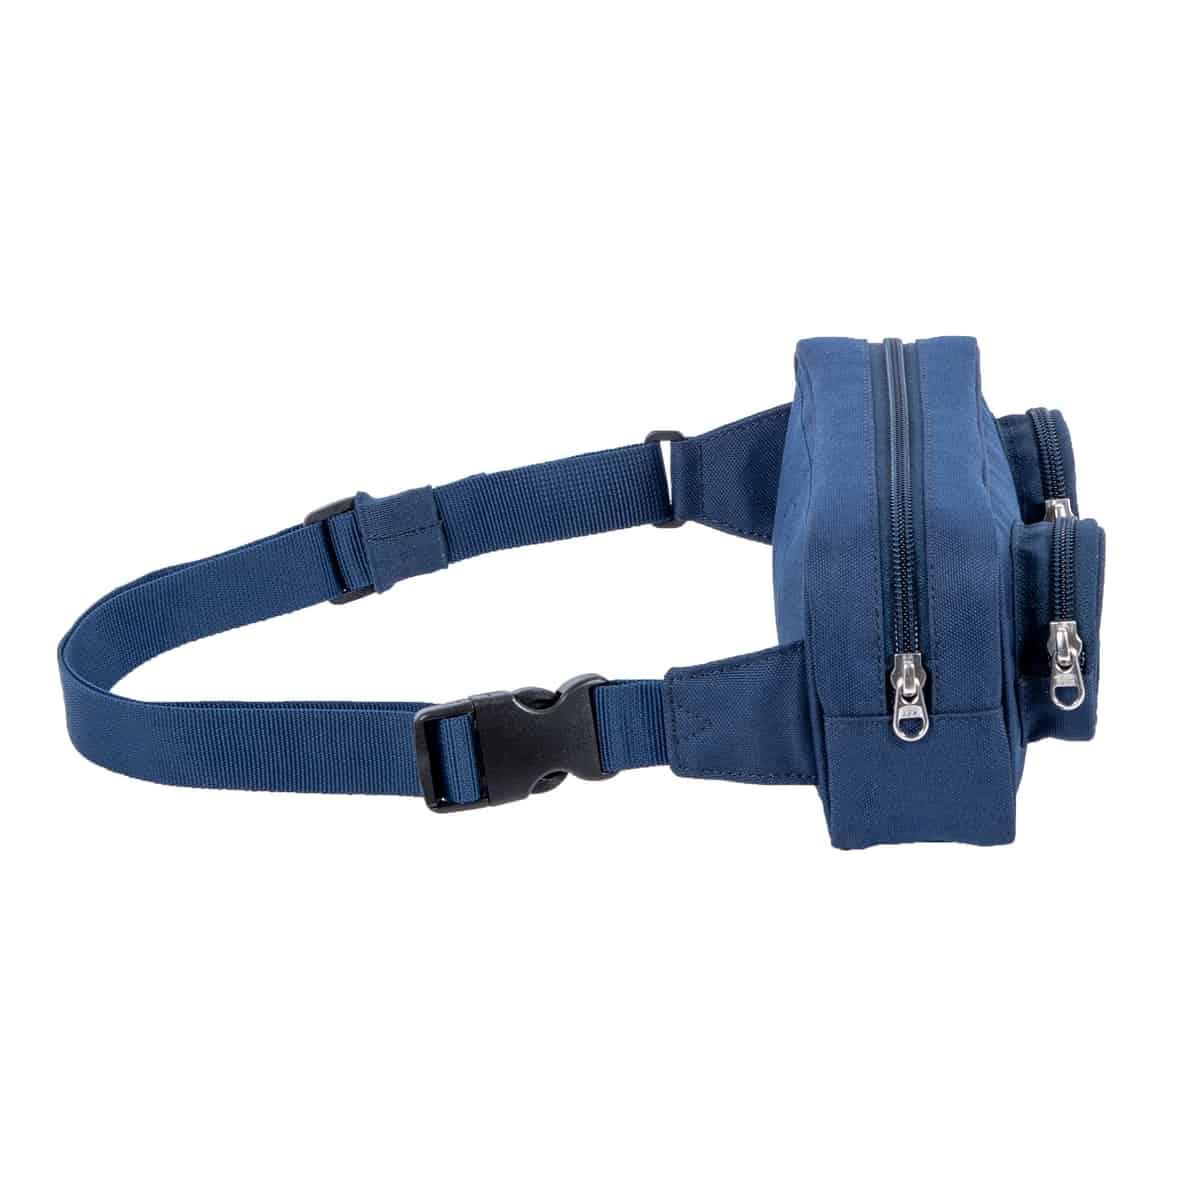 lego 5006976 brick hip pack navy